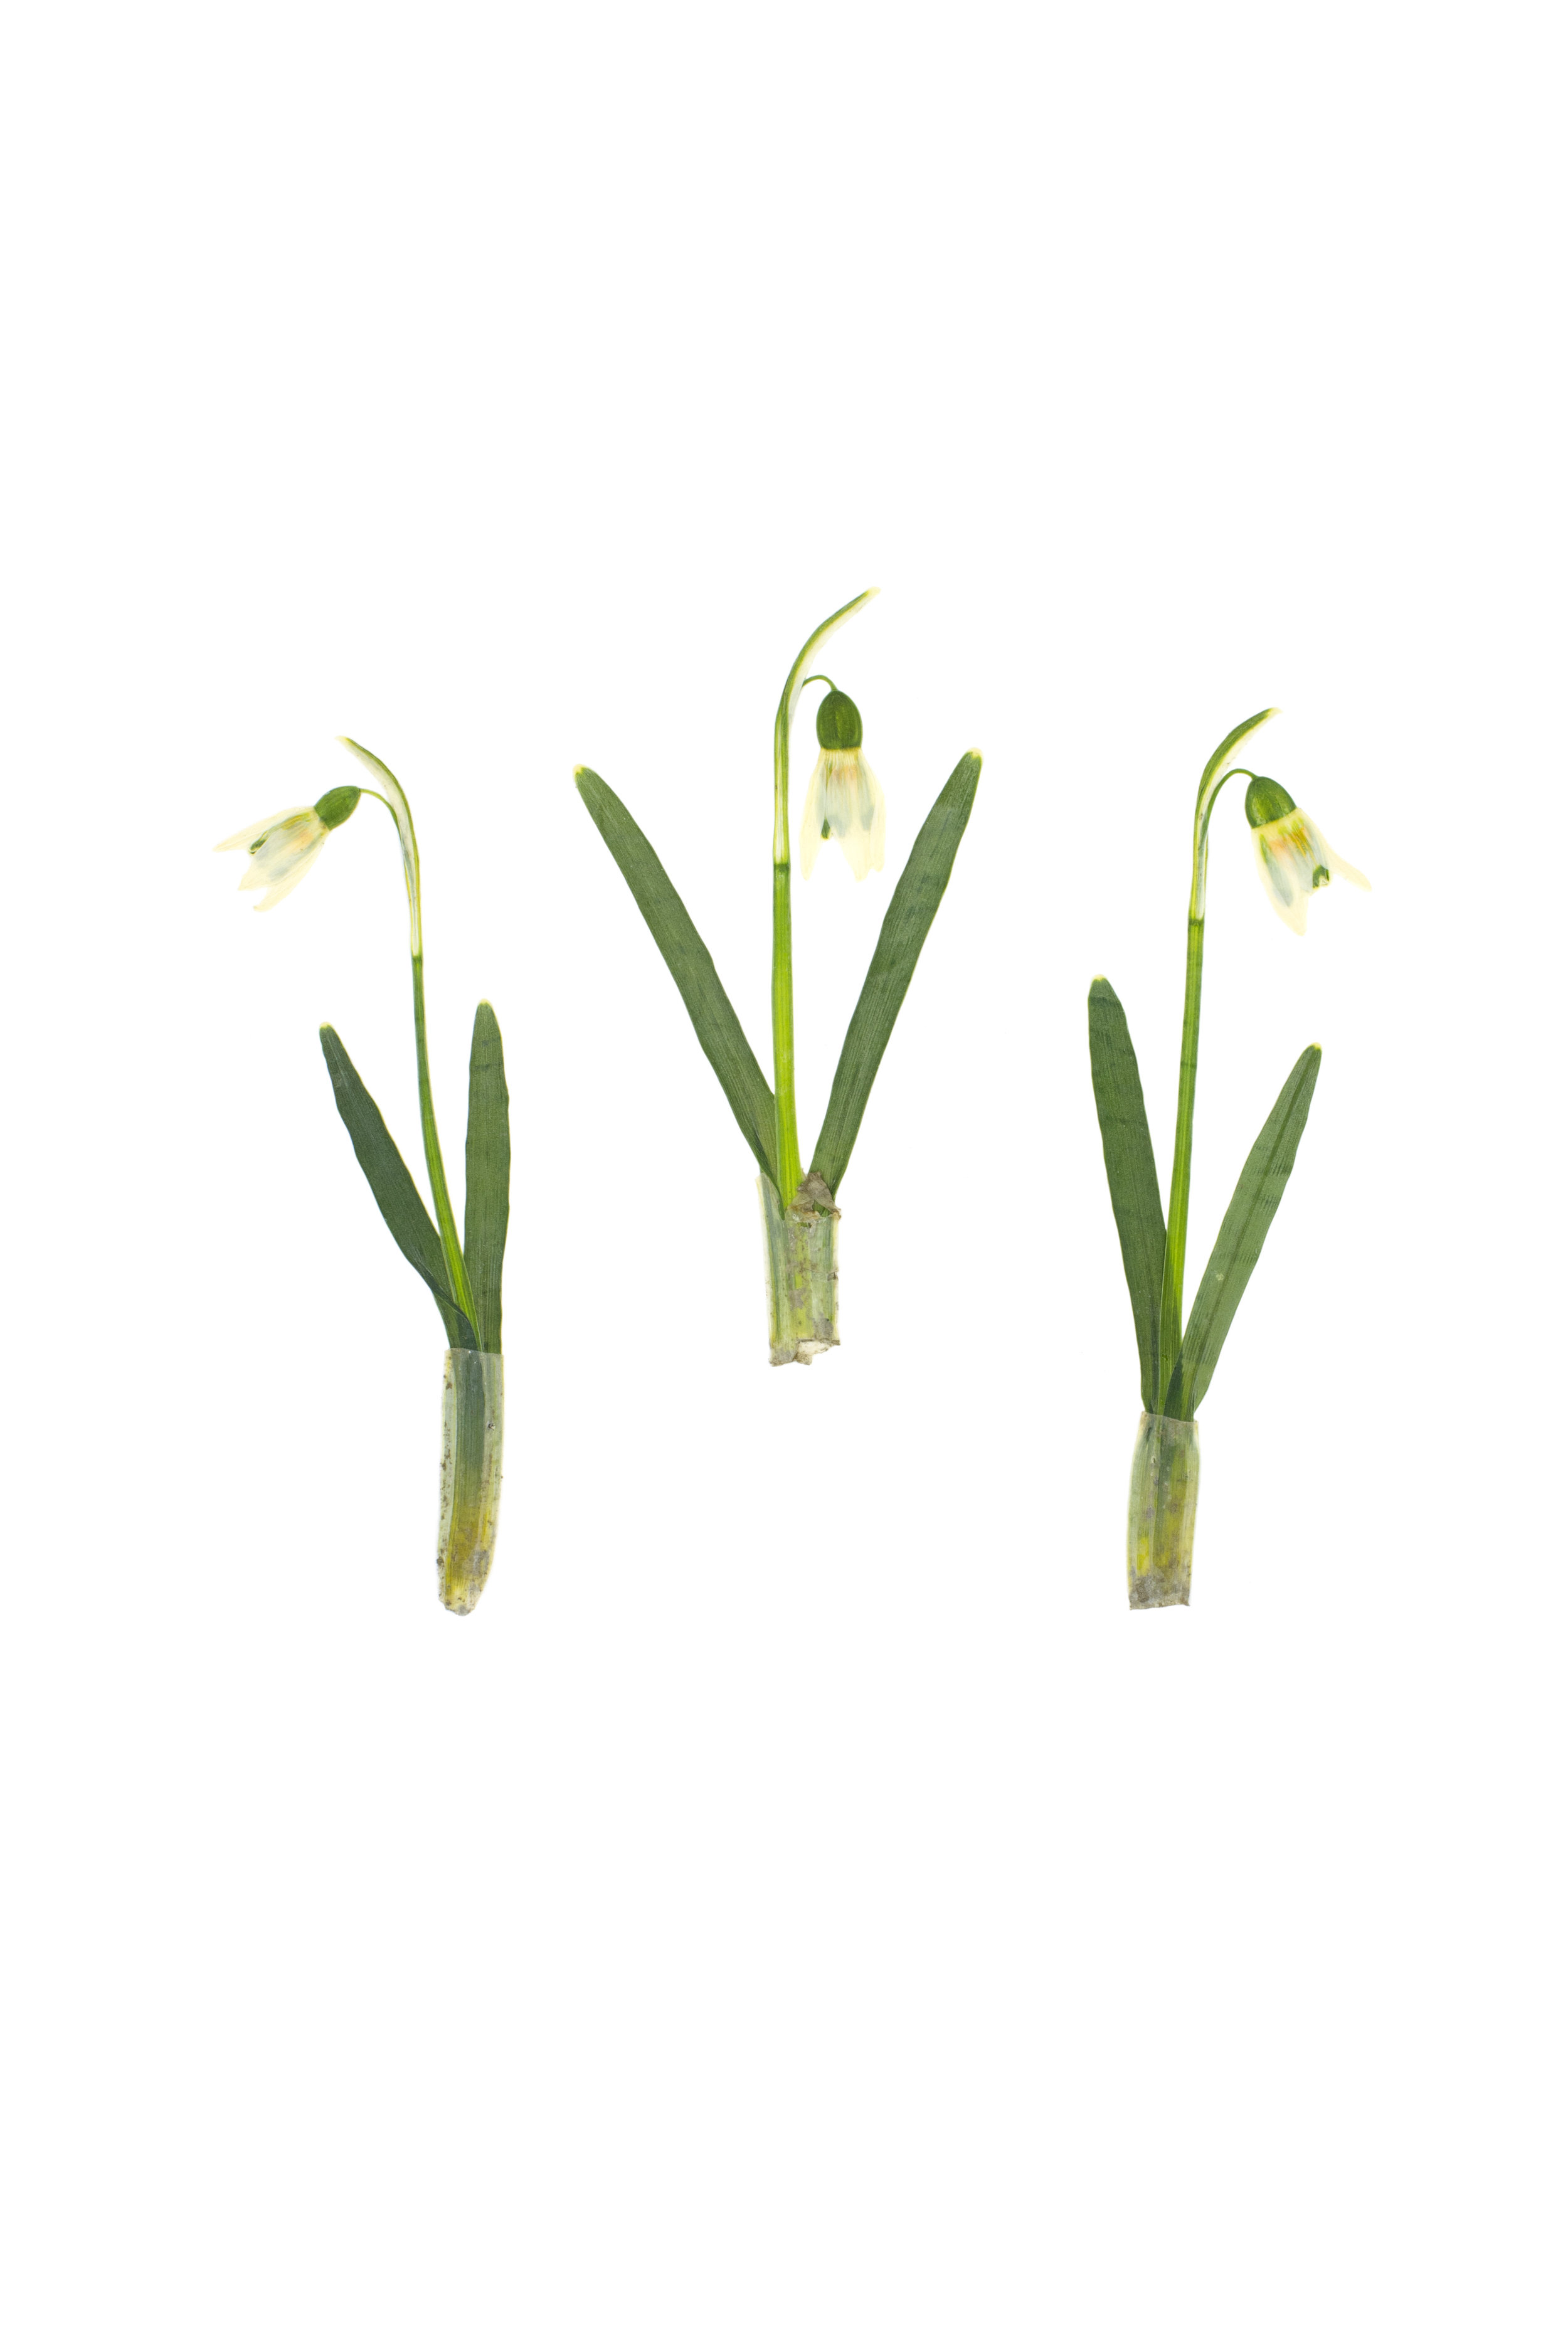 Snowdrops / Galanthus nivalis